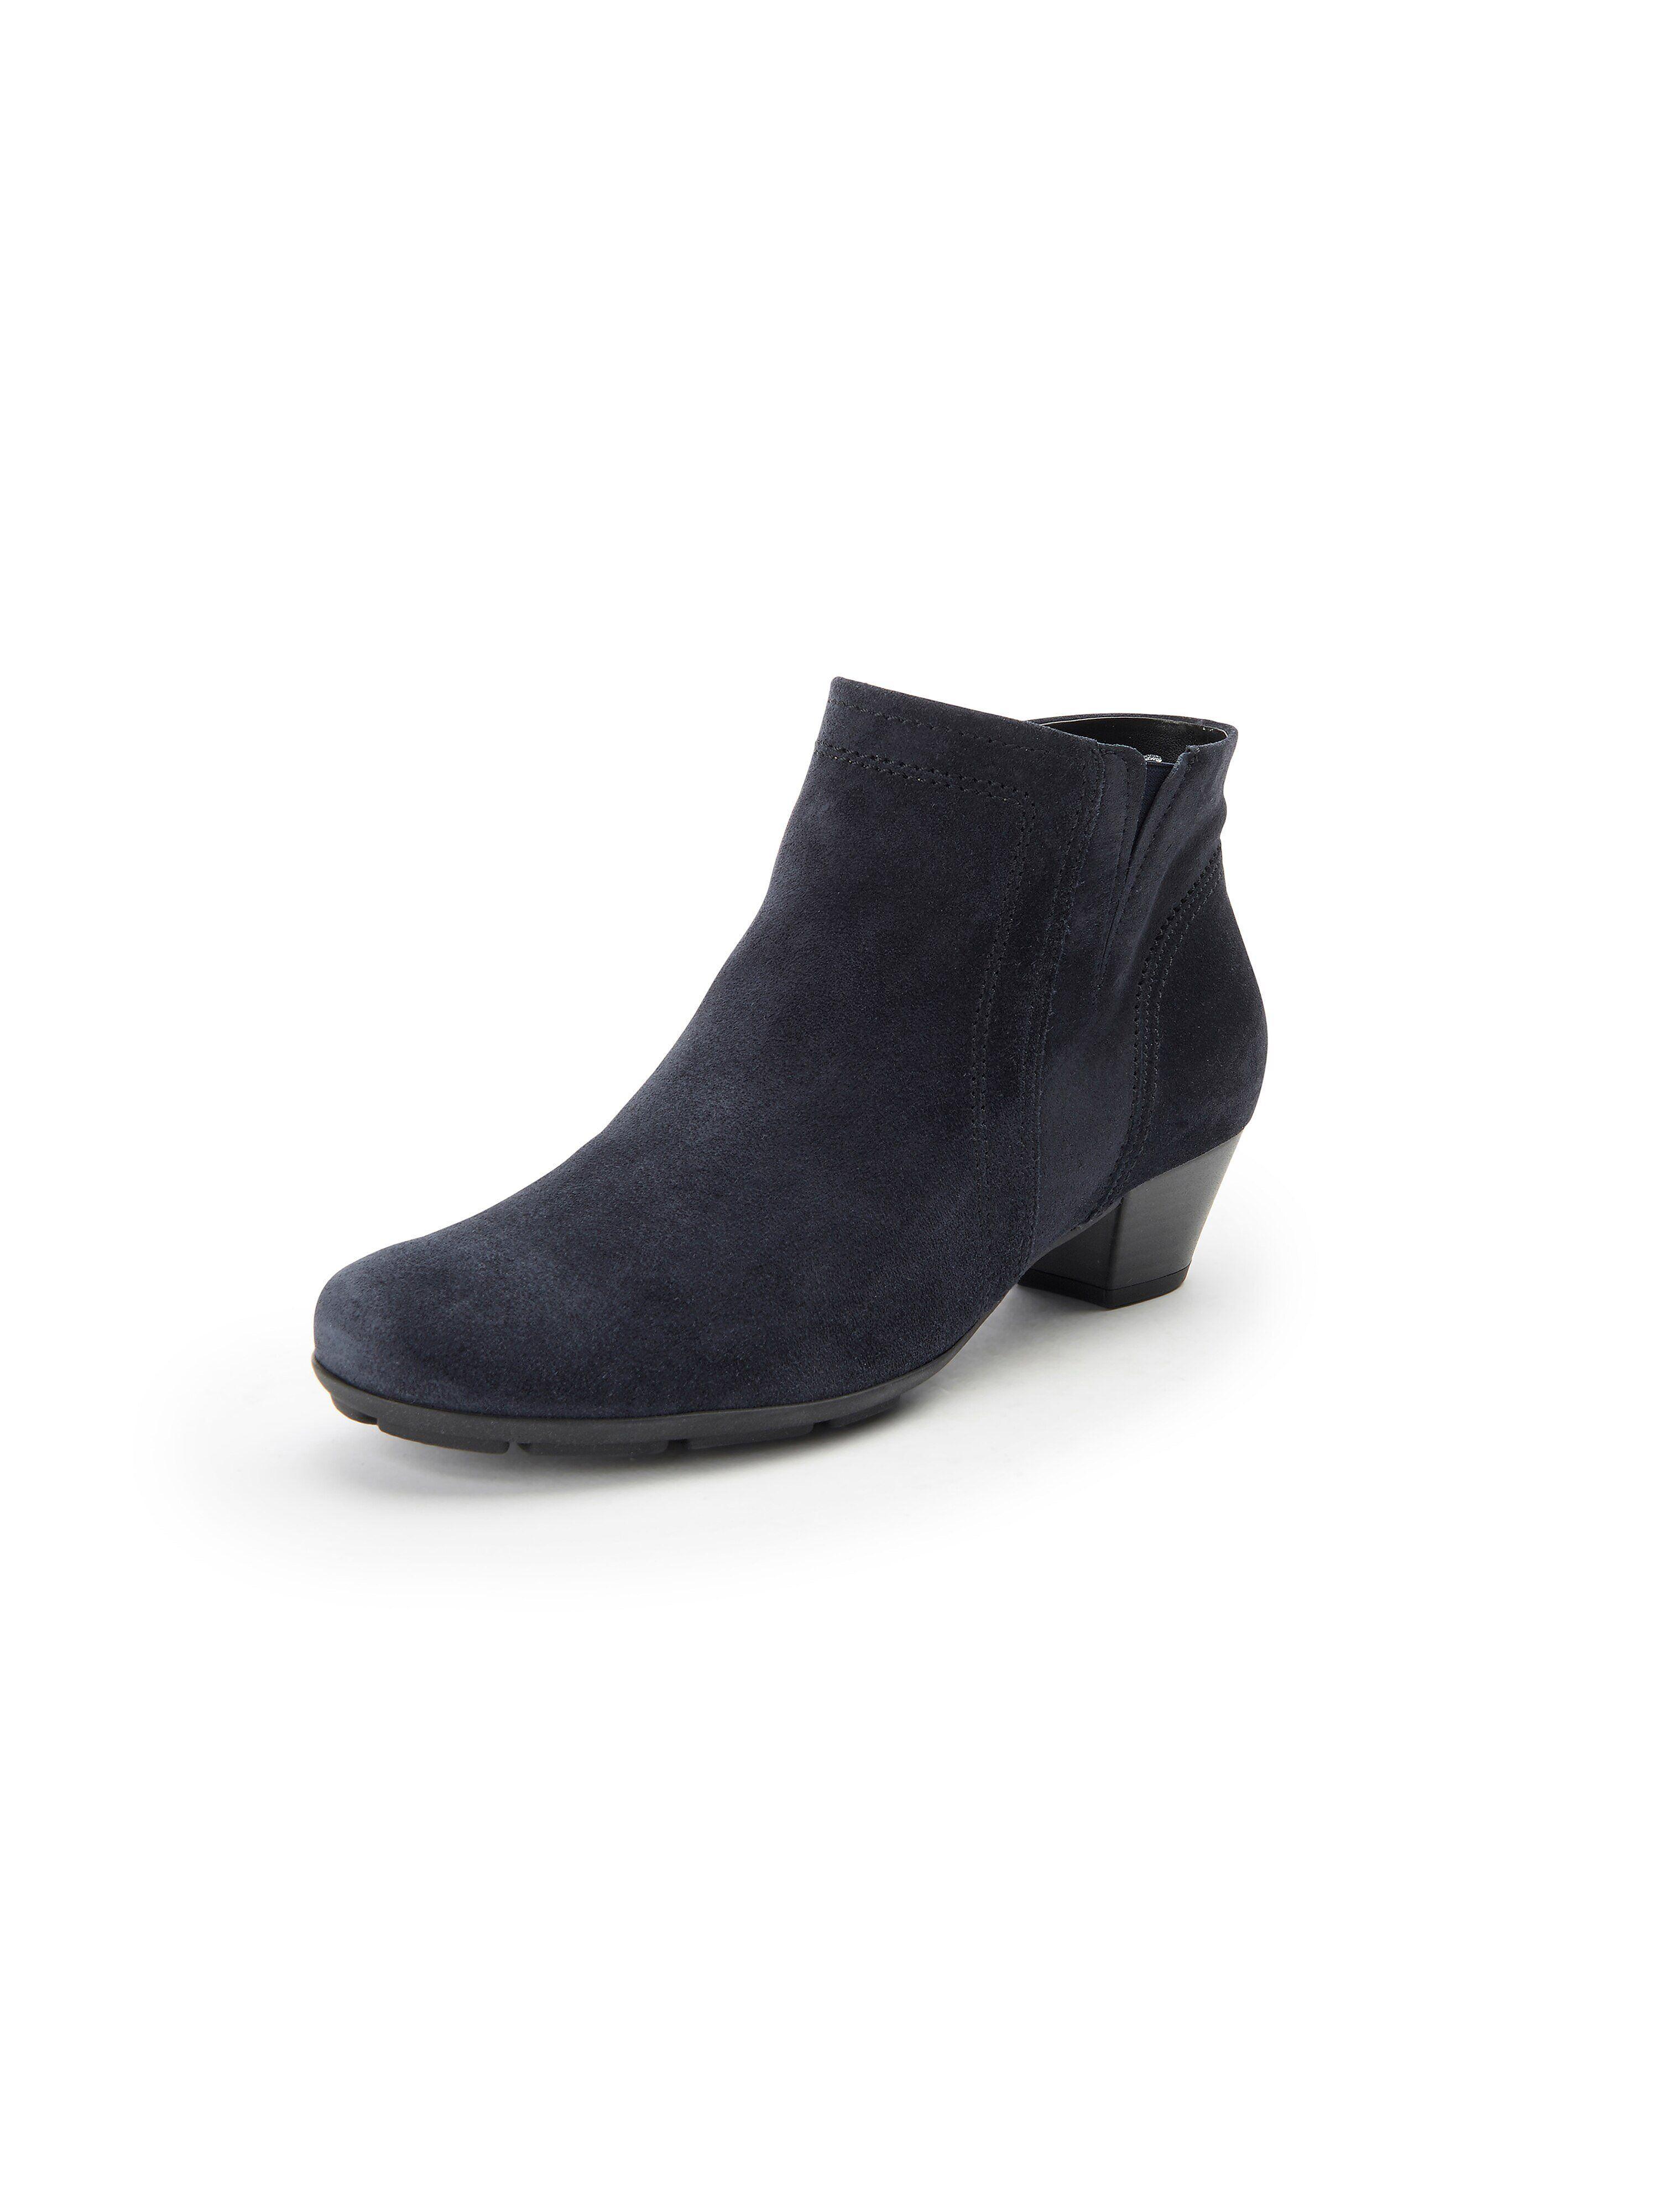 Gabor Les bottines 100% cuir  Gabor bleu  - Femme - 44